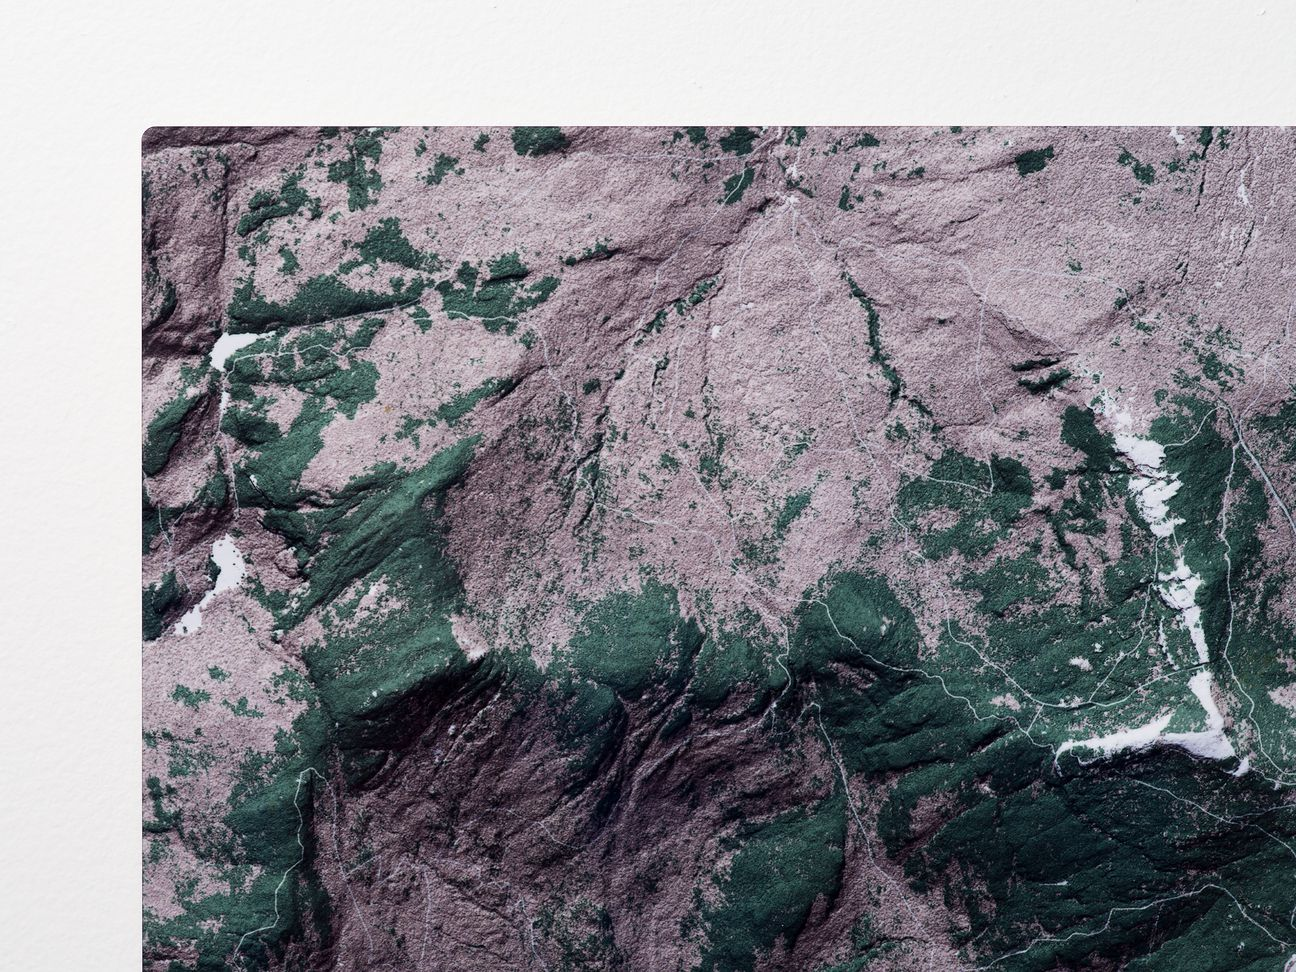 Mount Mansfield Aluminum Map Detail